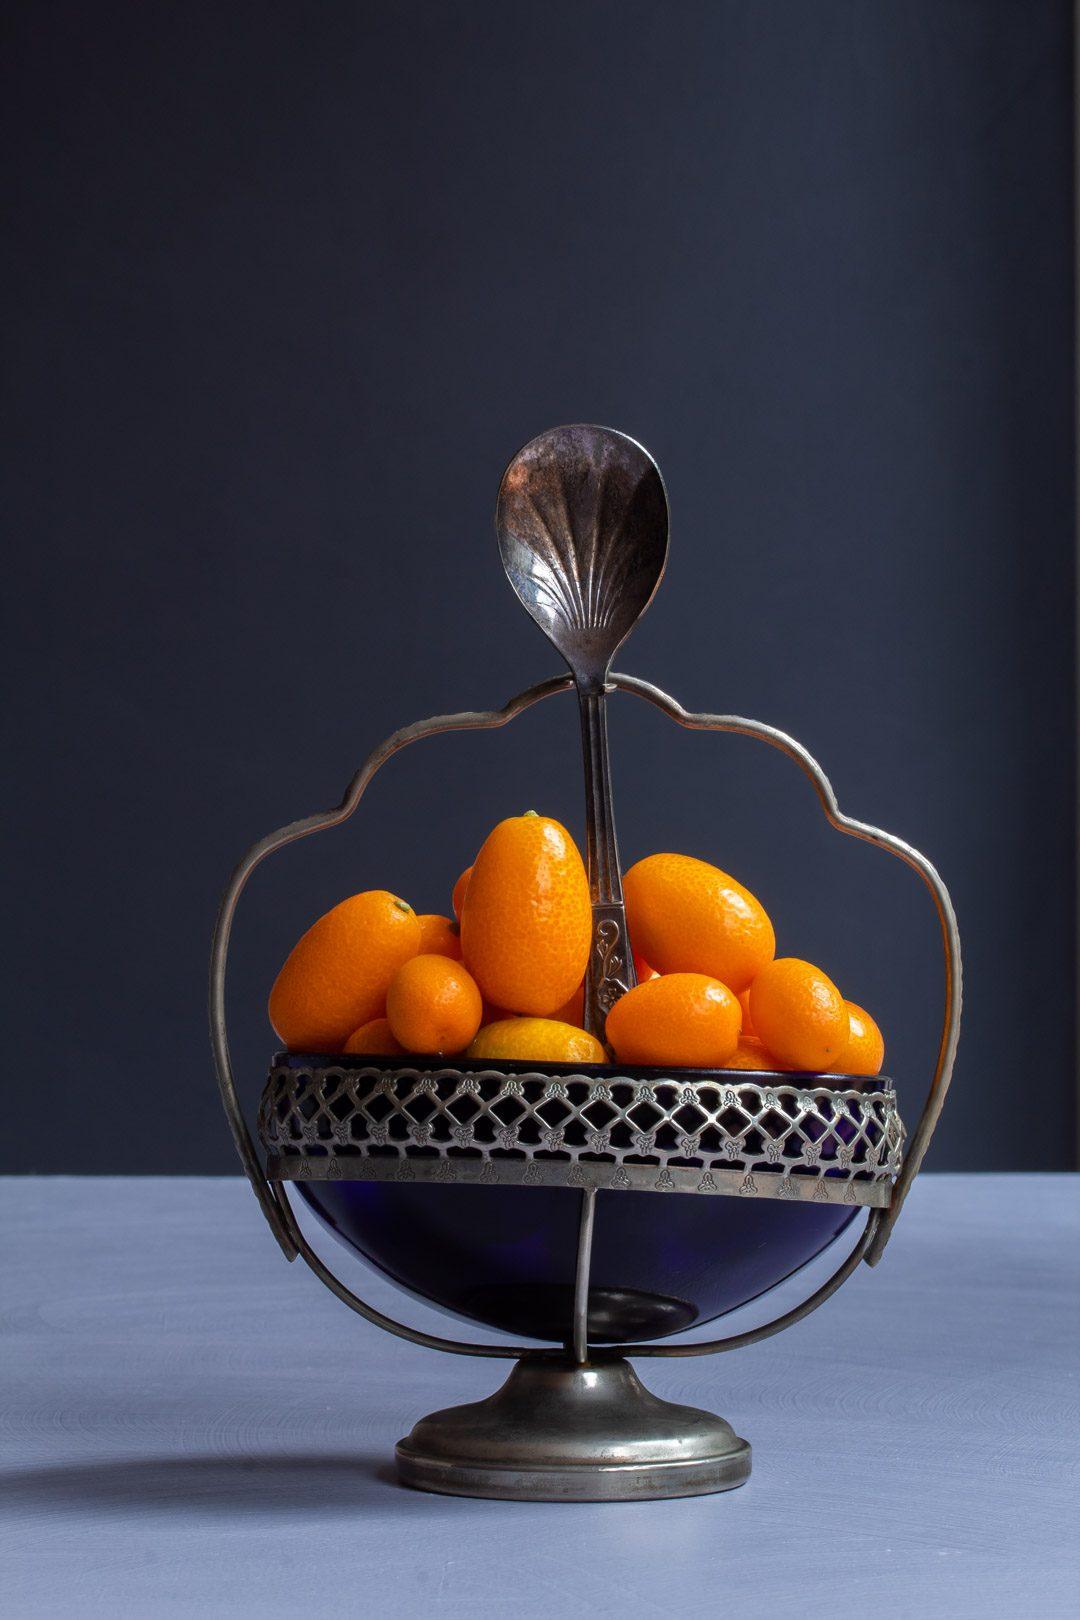 making cumquat brandy with cumquats in blue glass vintage sugar bowl with spoon